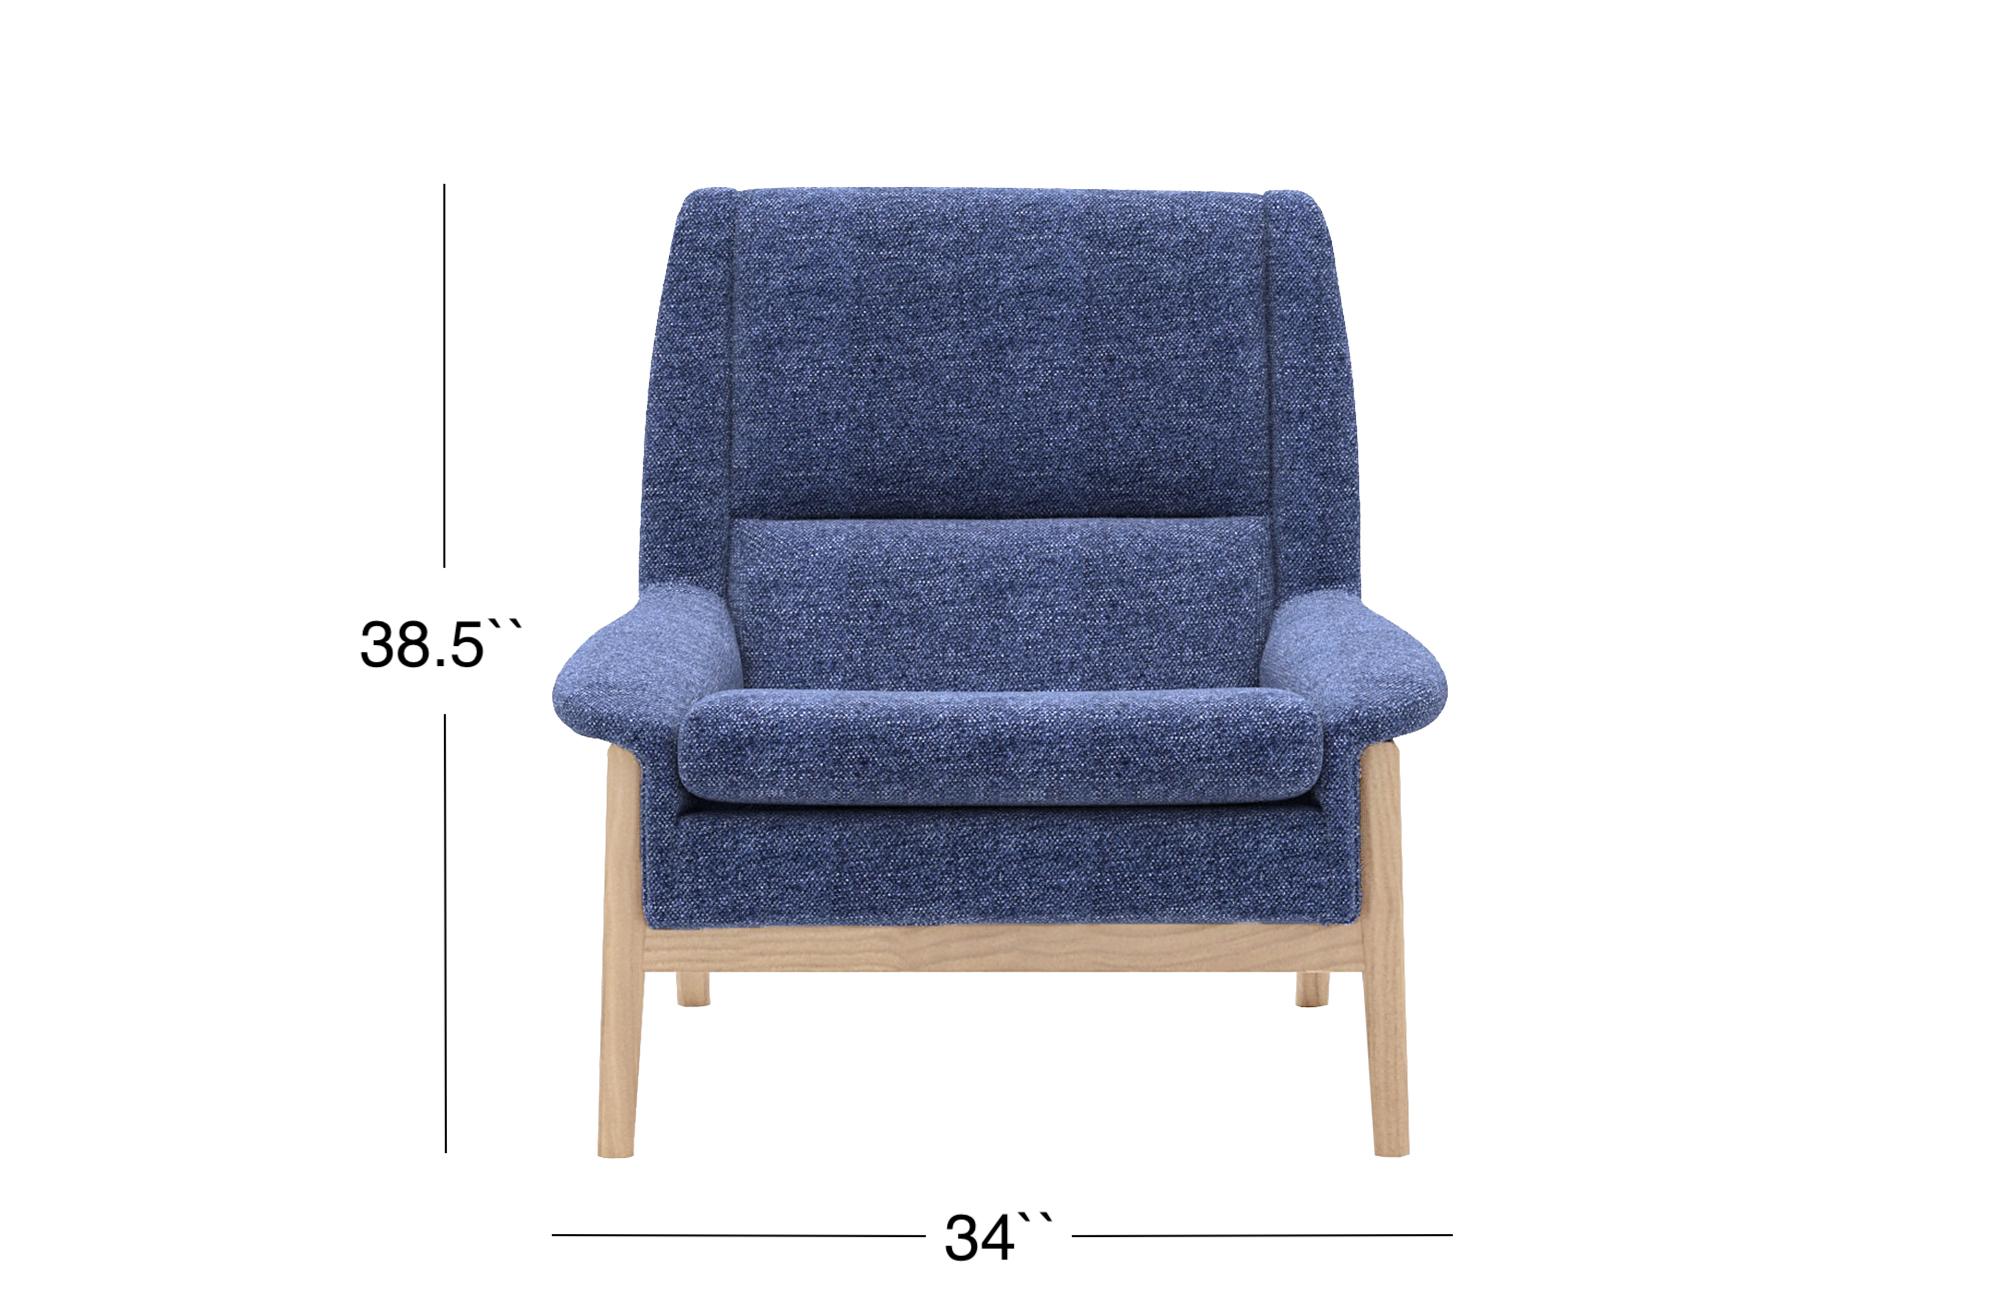 Venezia Lounge Chair - Denim Blue